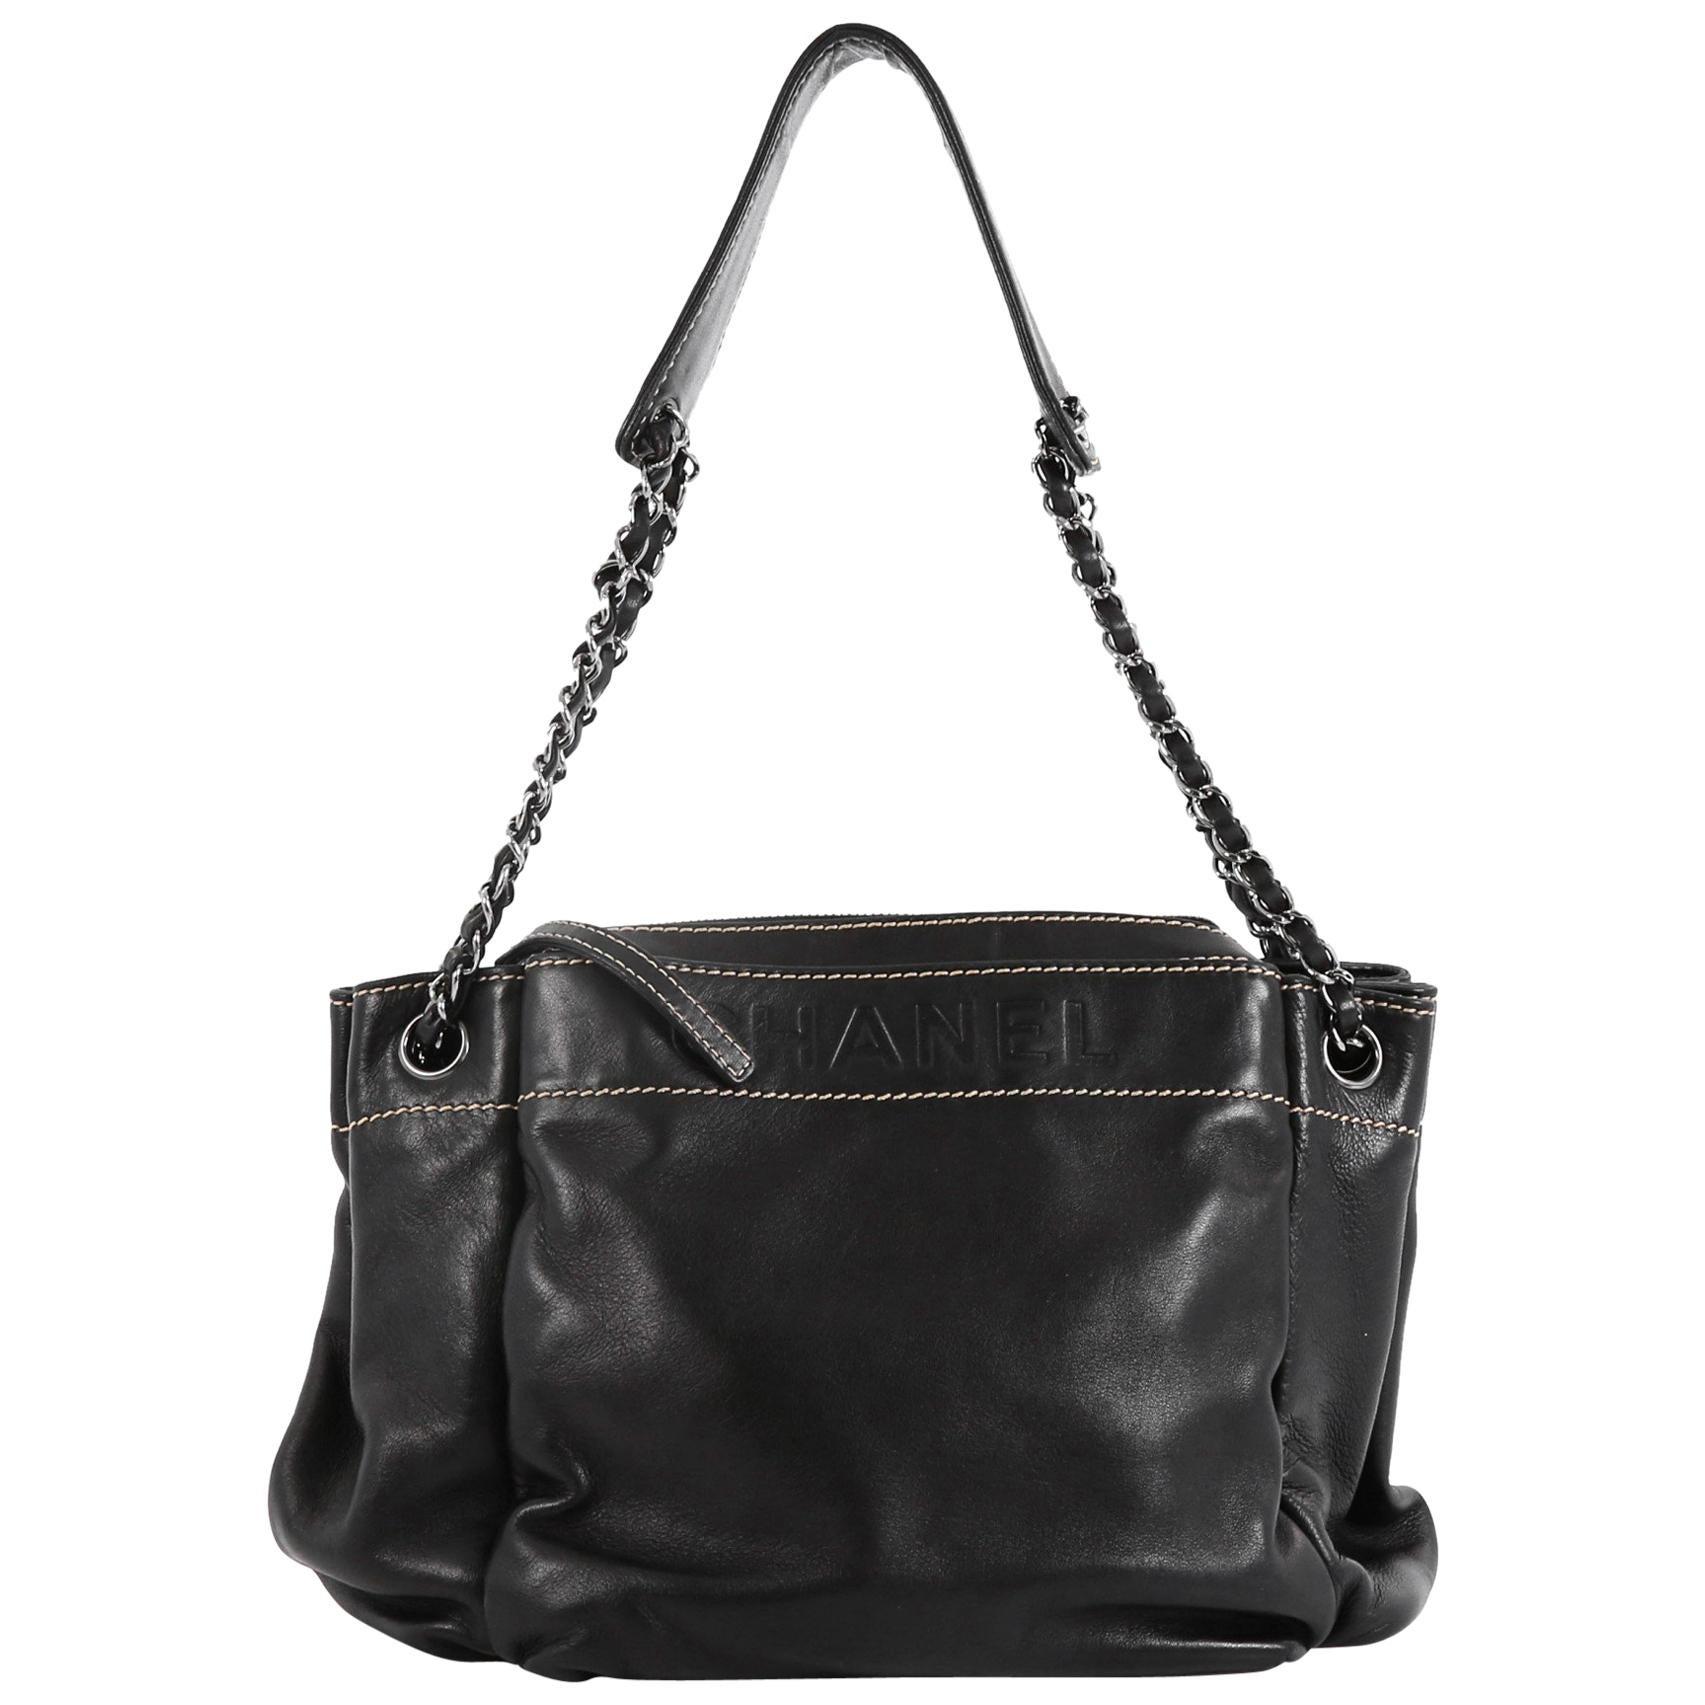 a7081c4a6664 Rebag Handbags and Purses - 1stdibs - Page 7